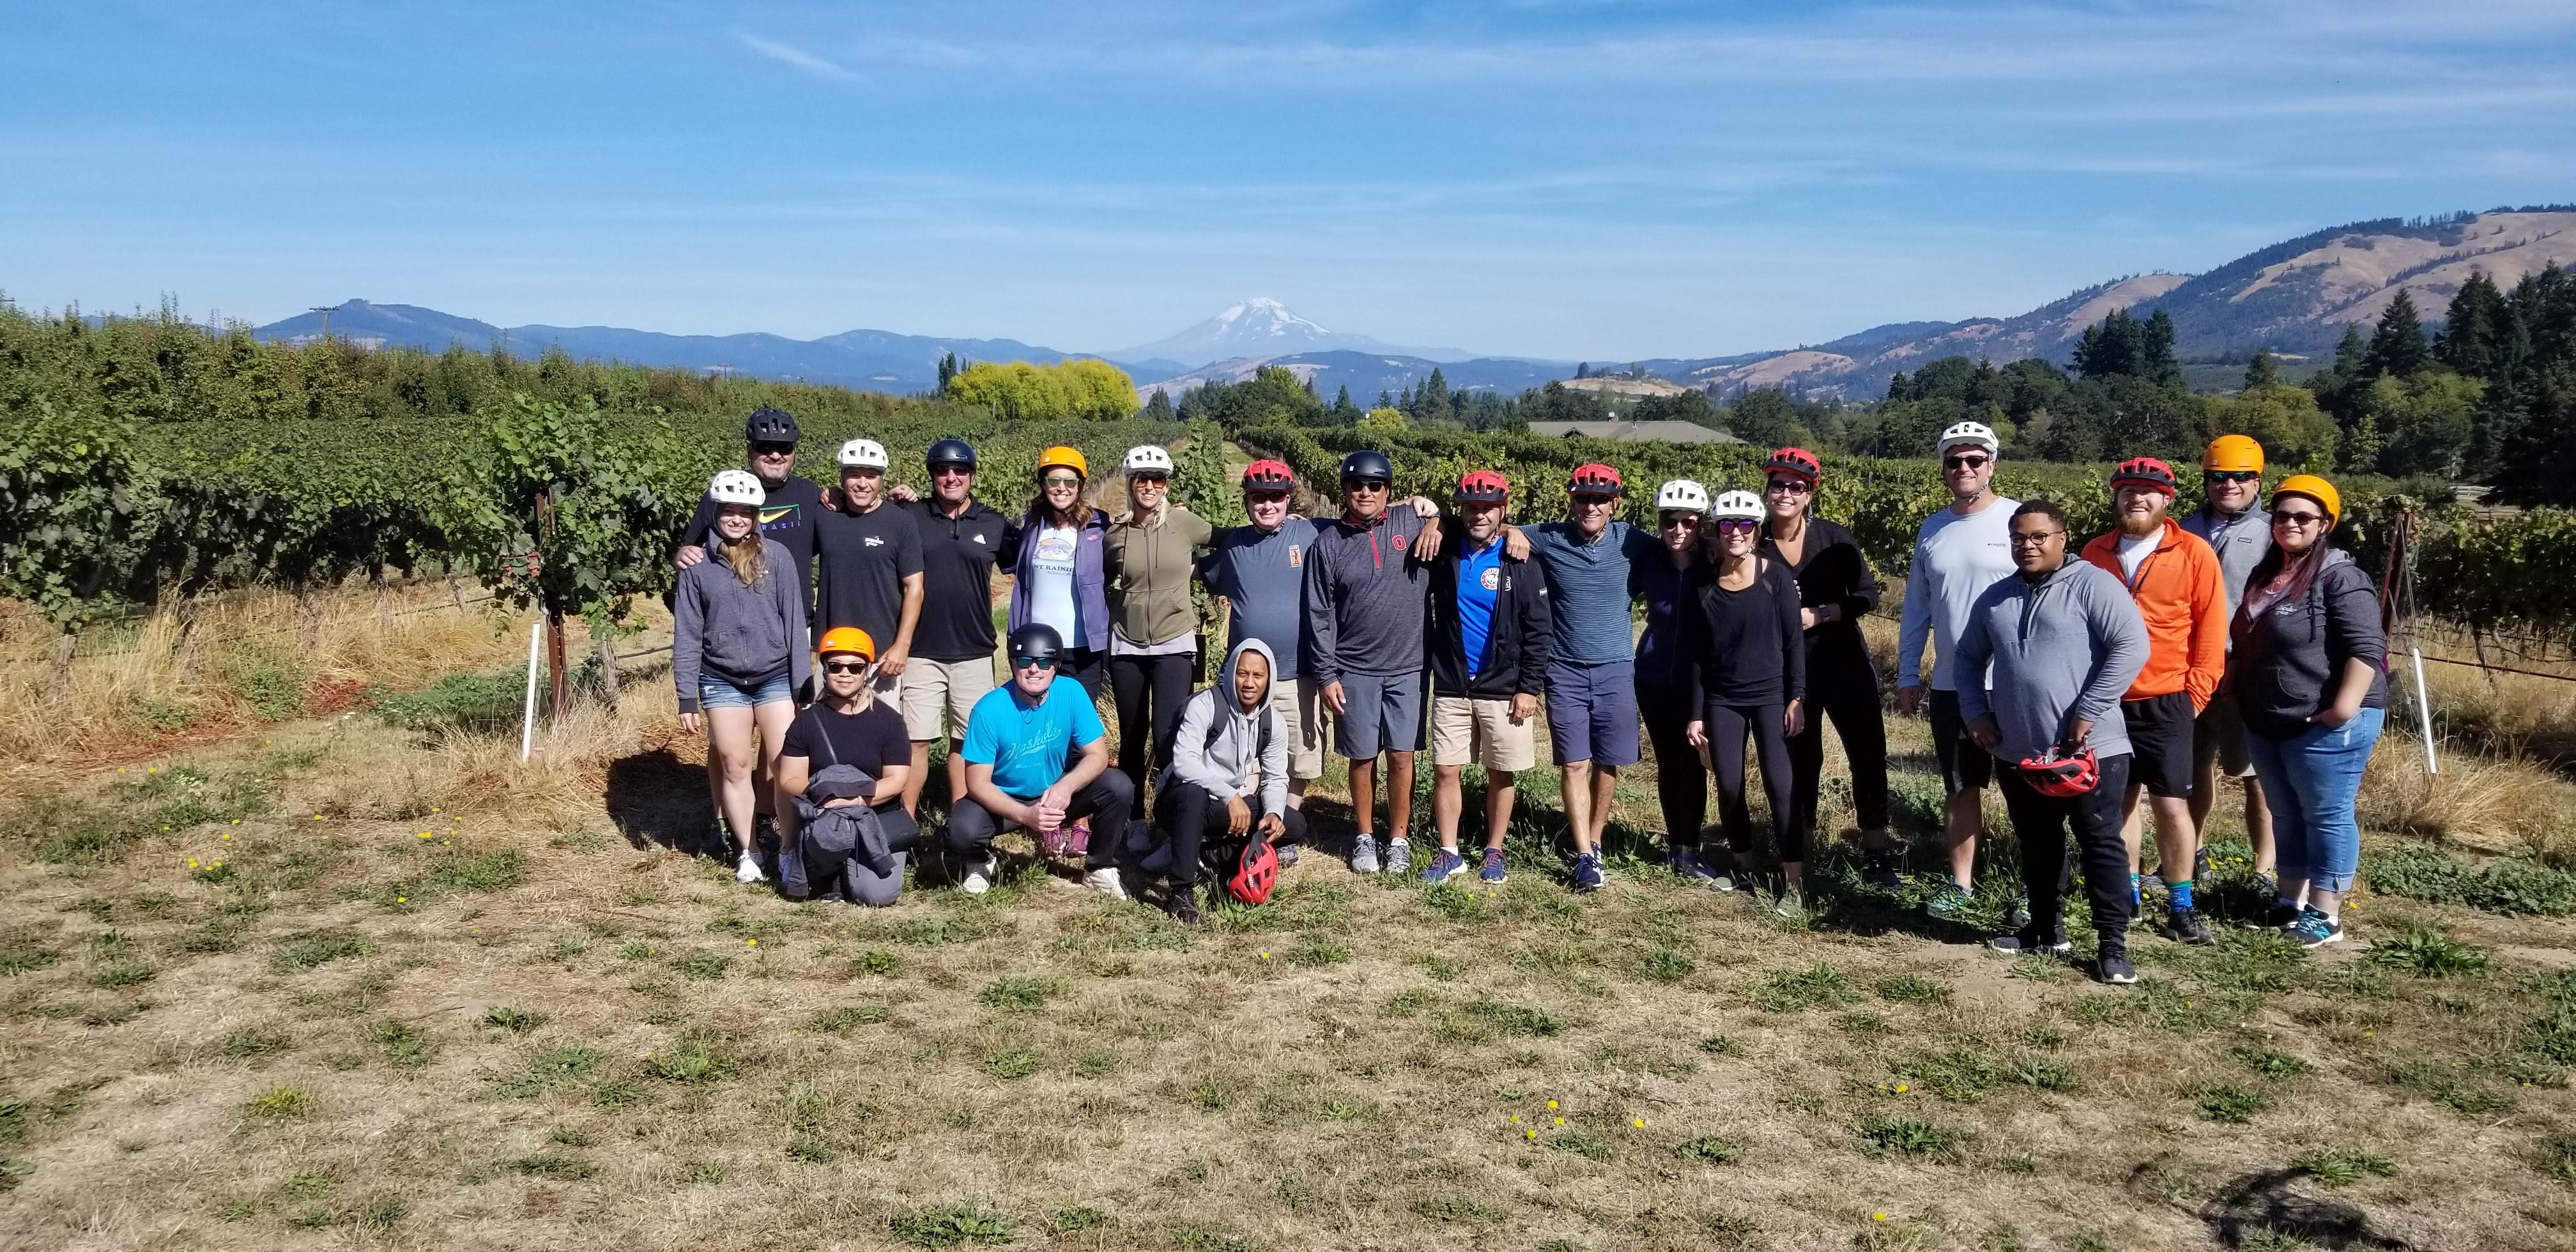 2018 Sherpa Trip, Portland, OR